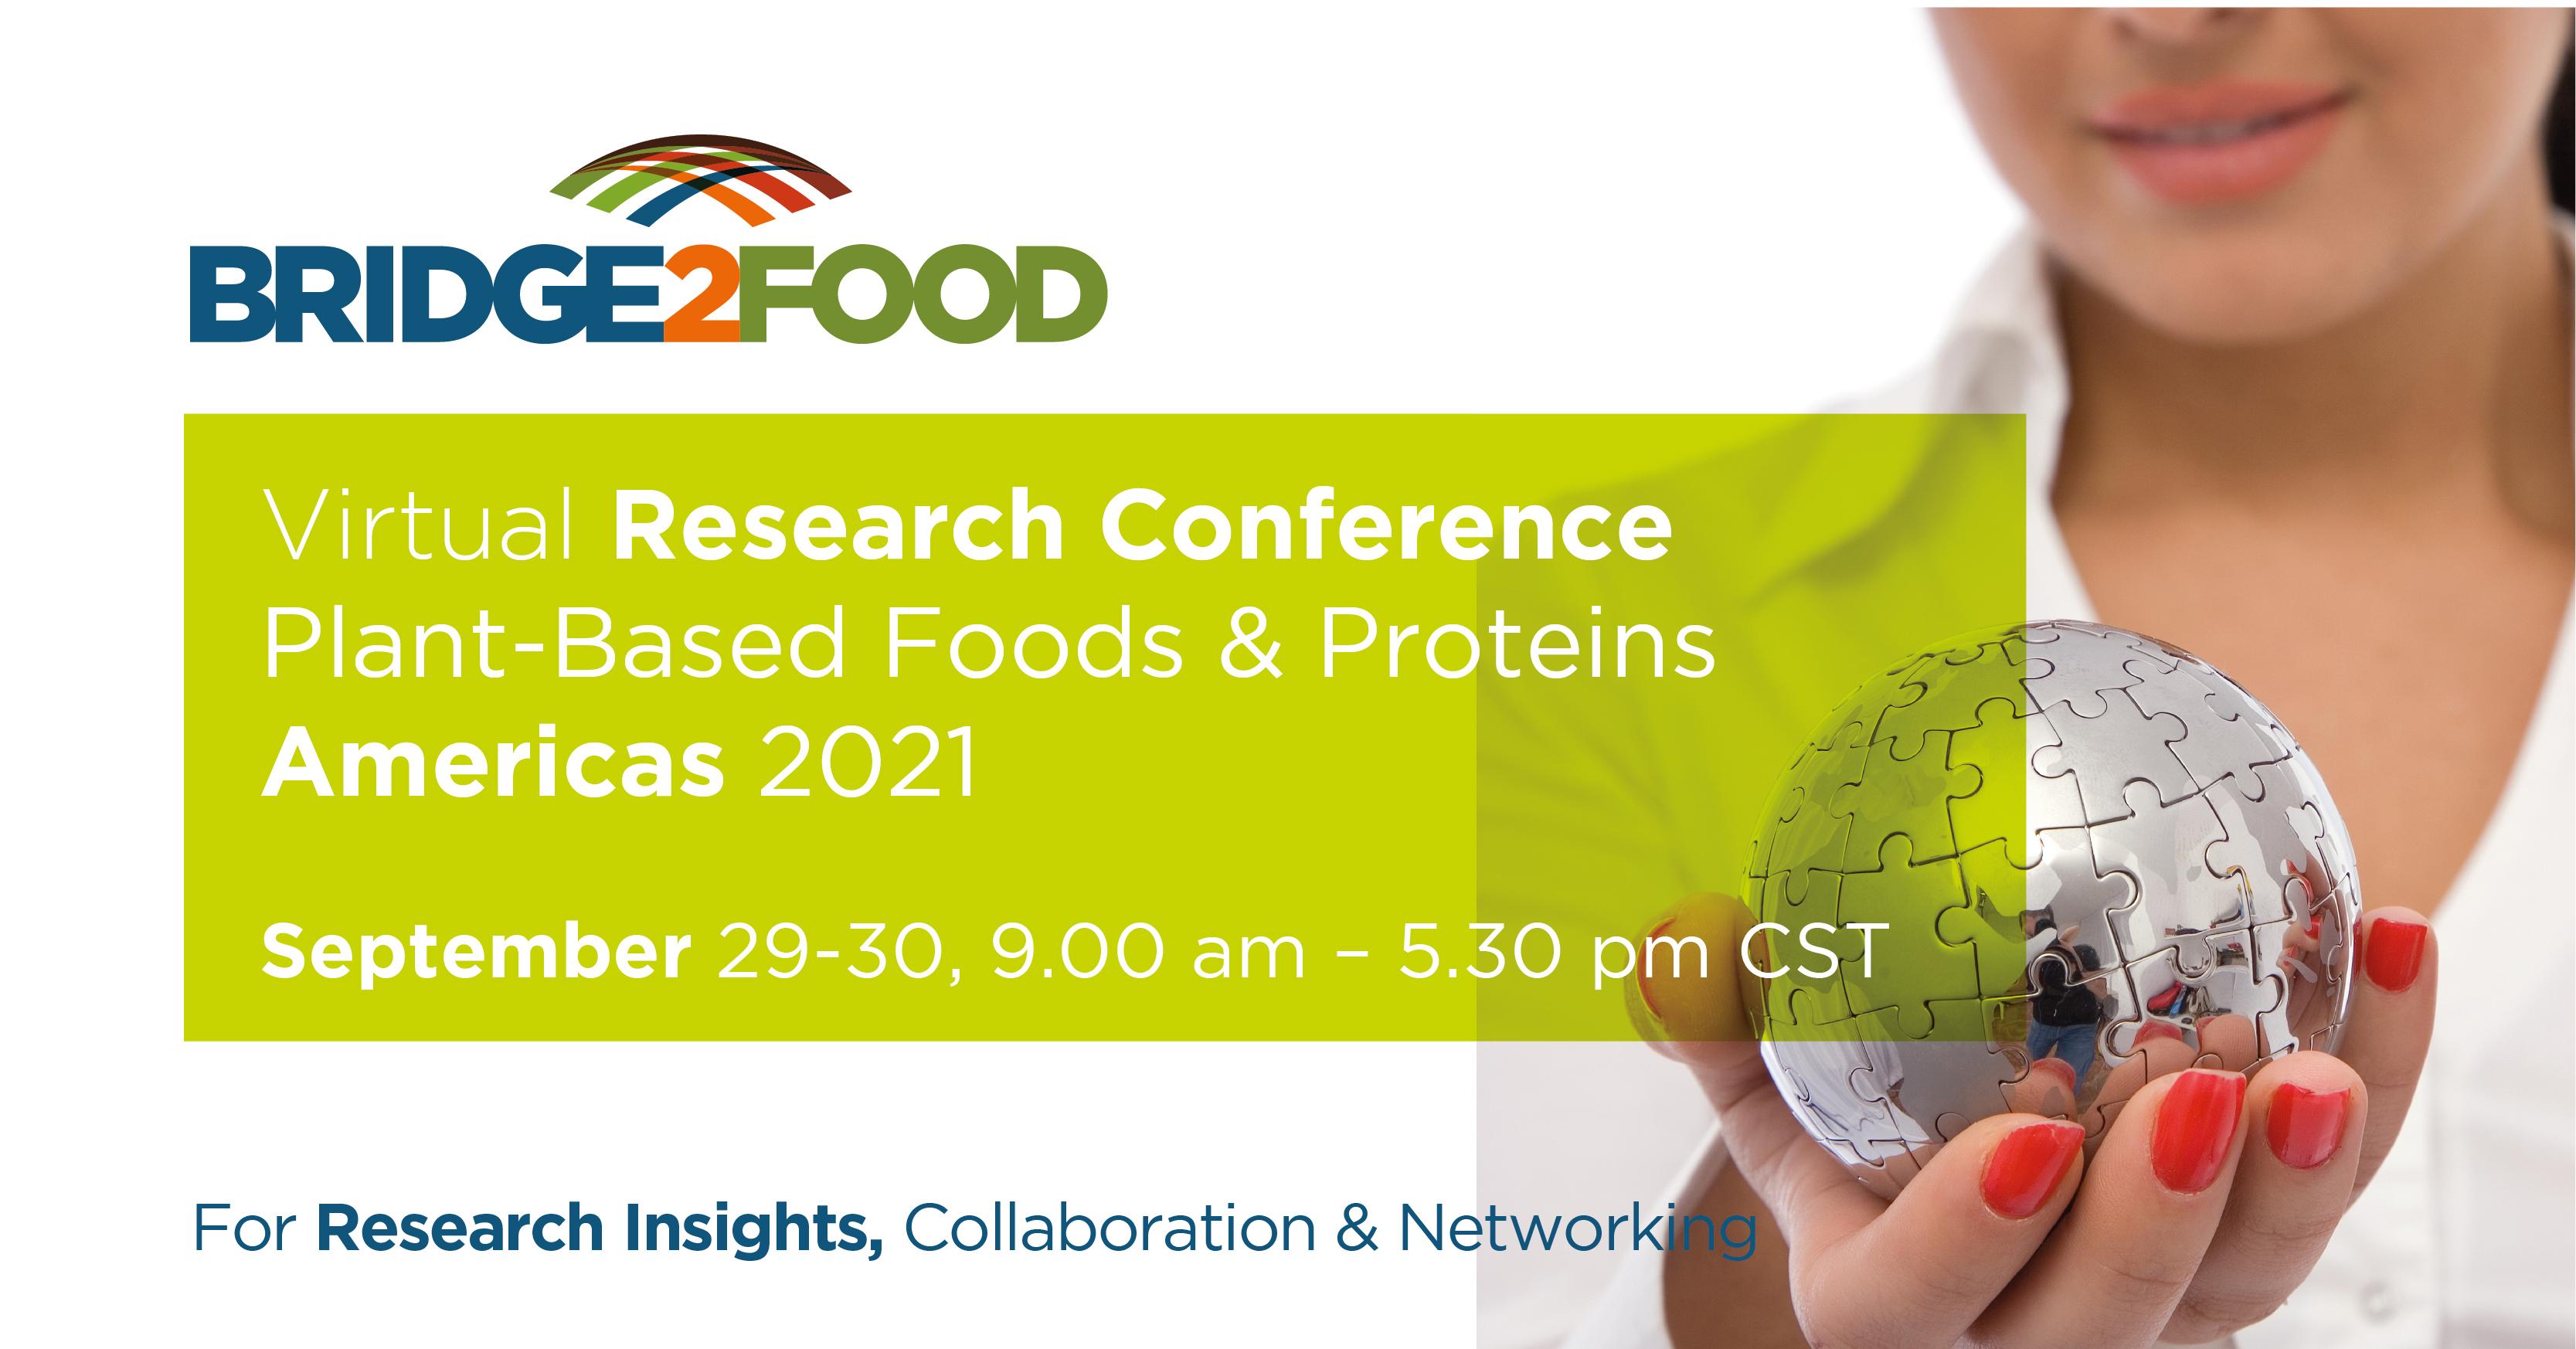 Bridge2Food_Banner_2021_Virtual_Research_Conference_Americas